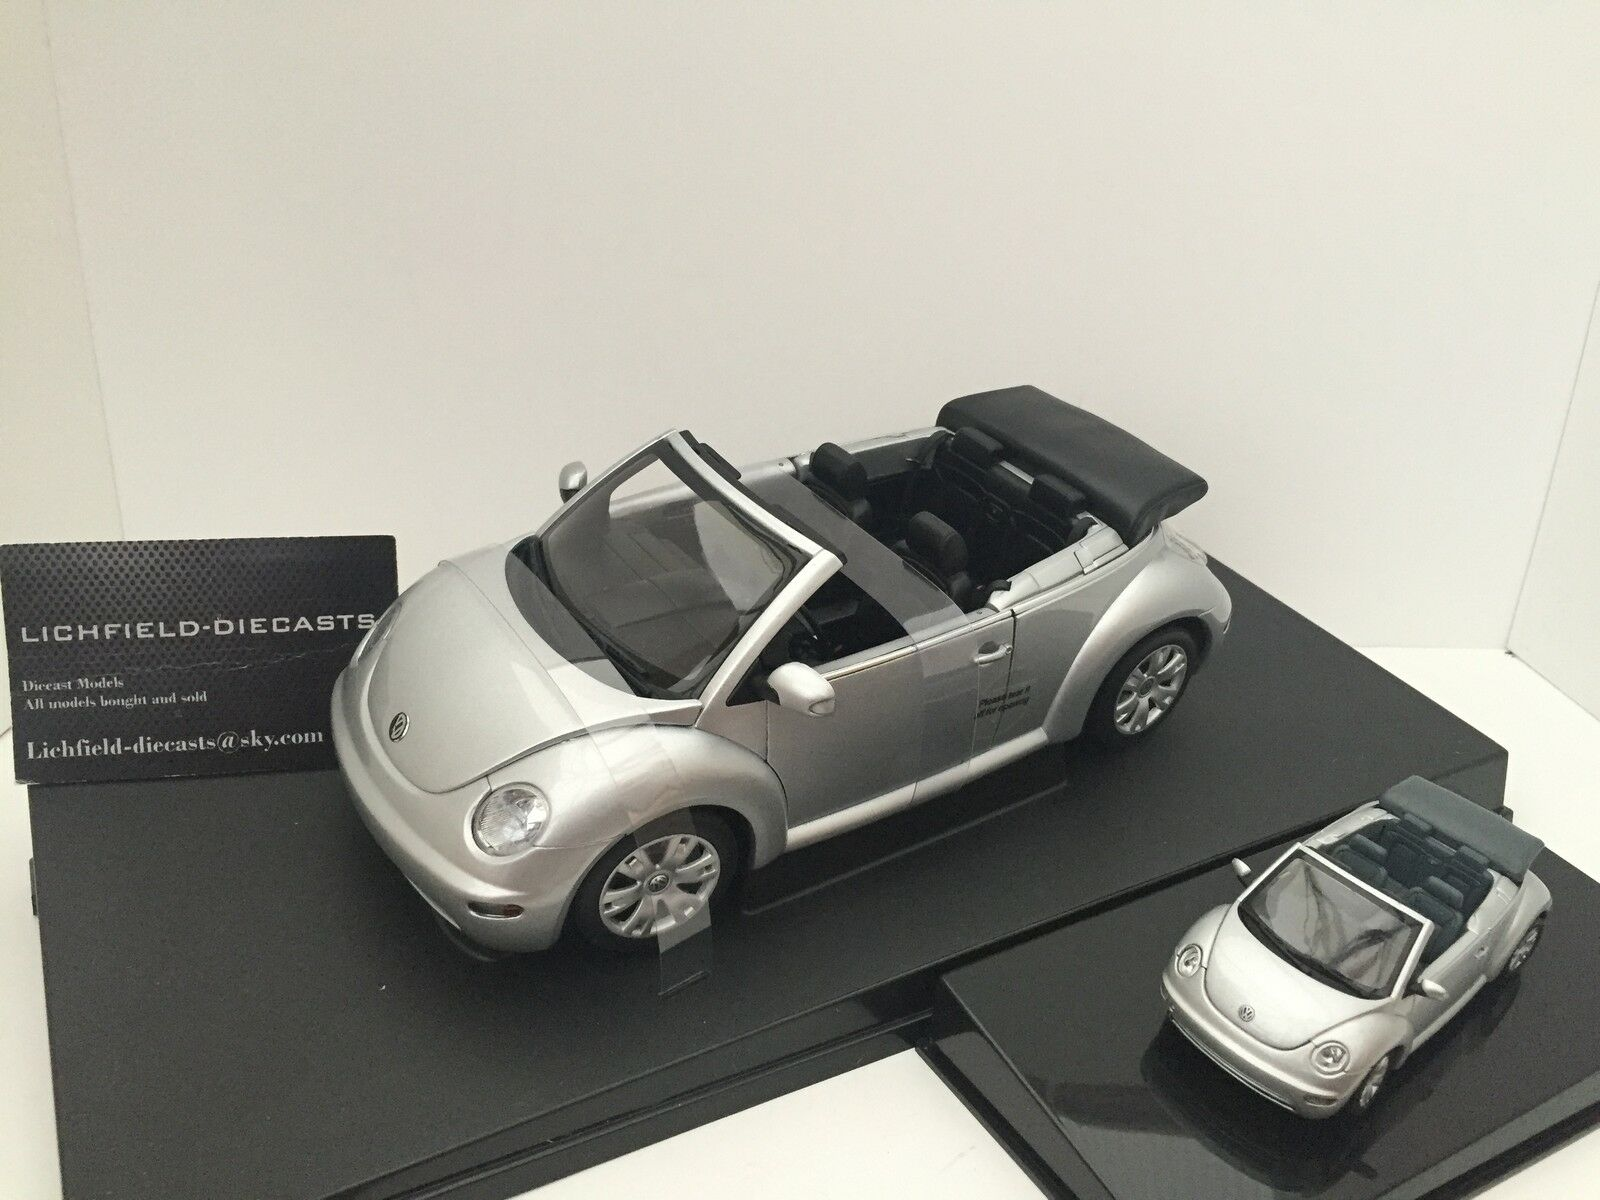 Autoart 1 18 1 43 VW NEW BEETLE CABRIO  Reflex argentoo Metallico  2 modelli